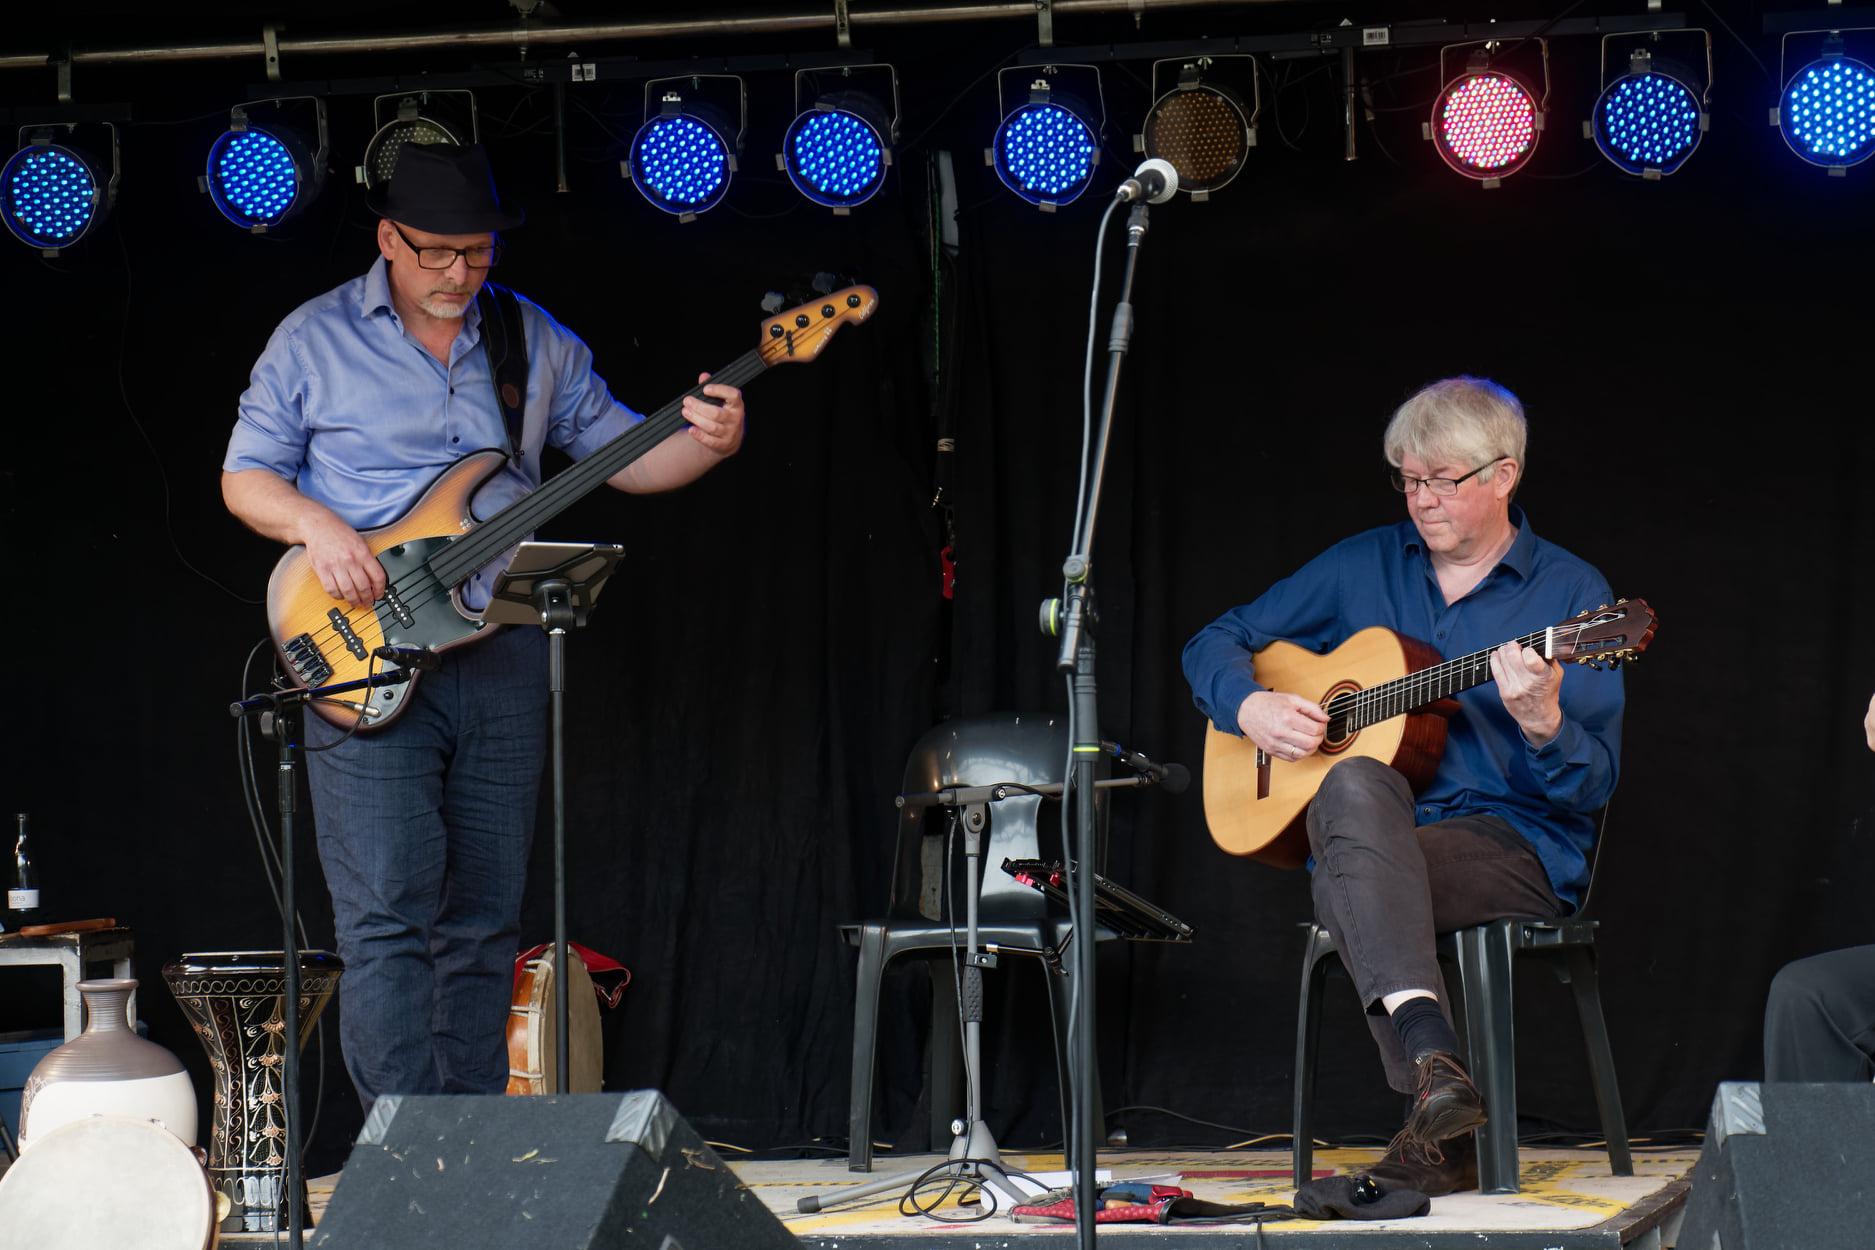 Michael und Olaf bei Kropp in Concert, Foto: Stephan May